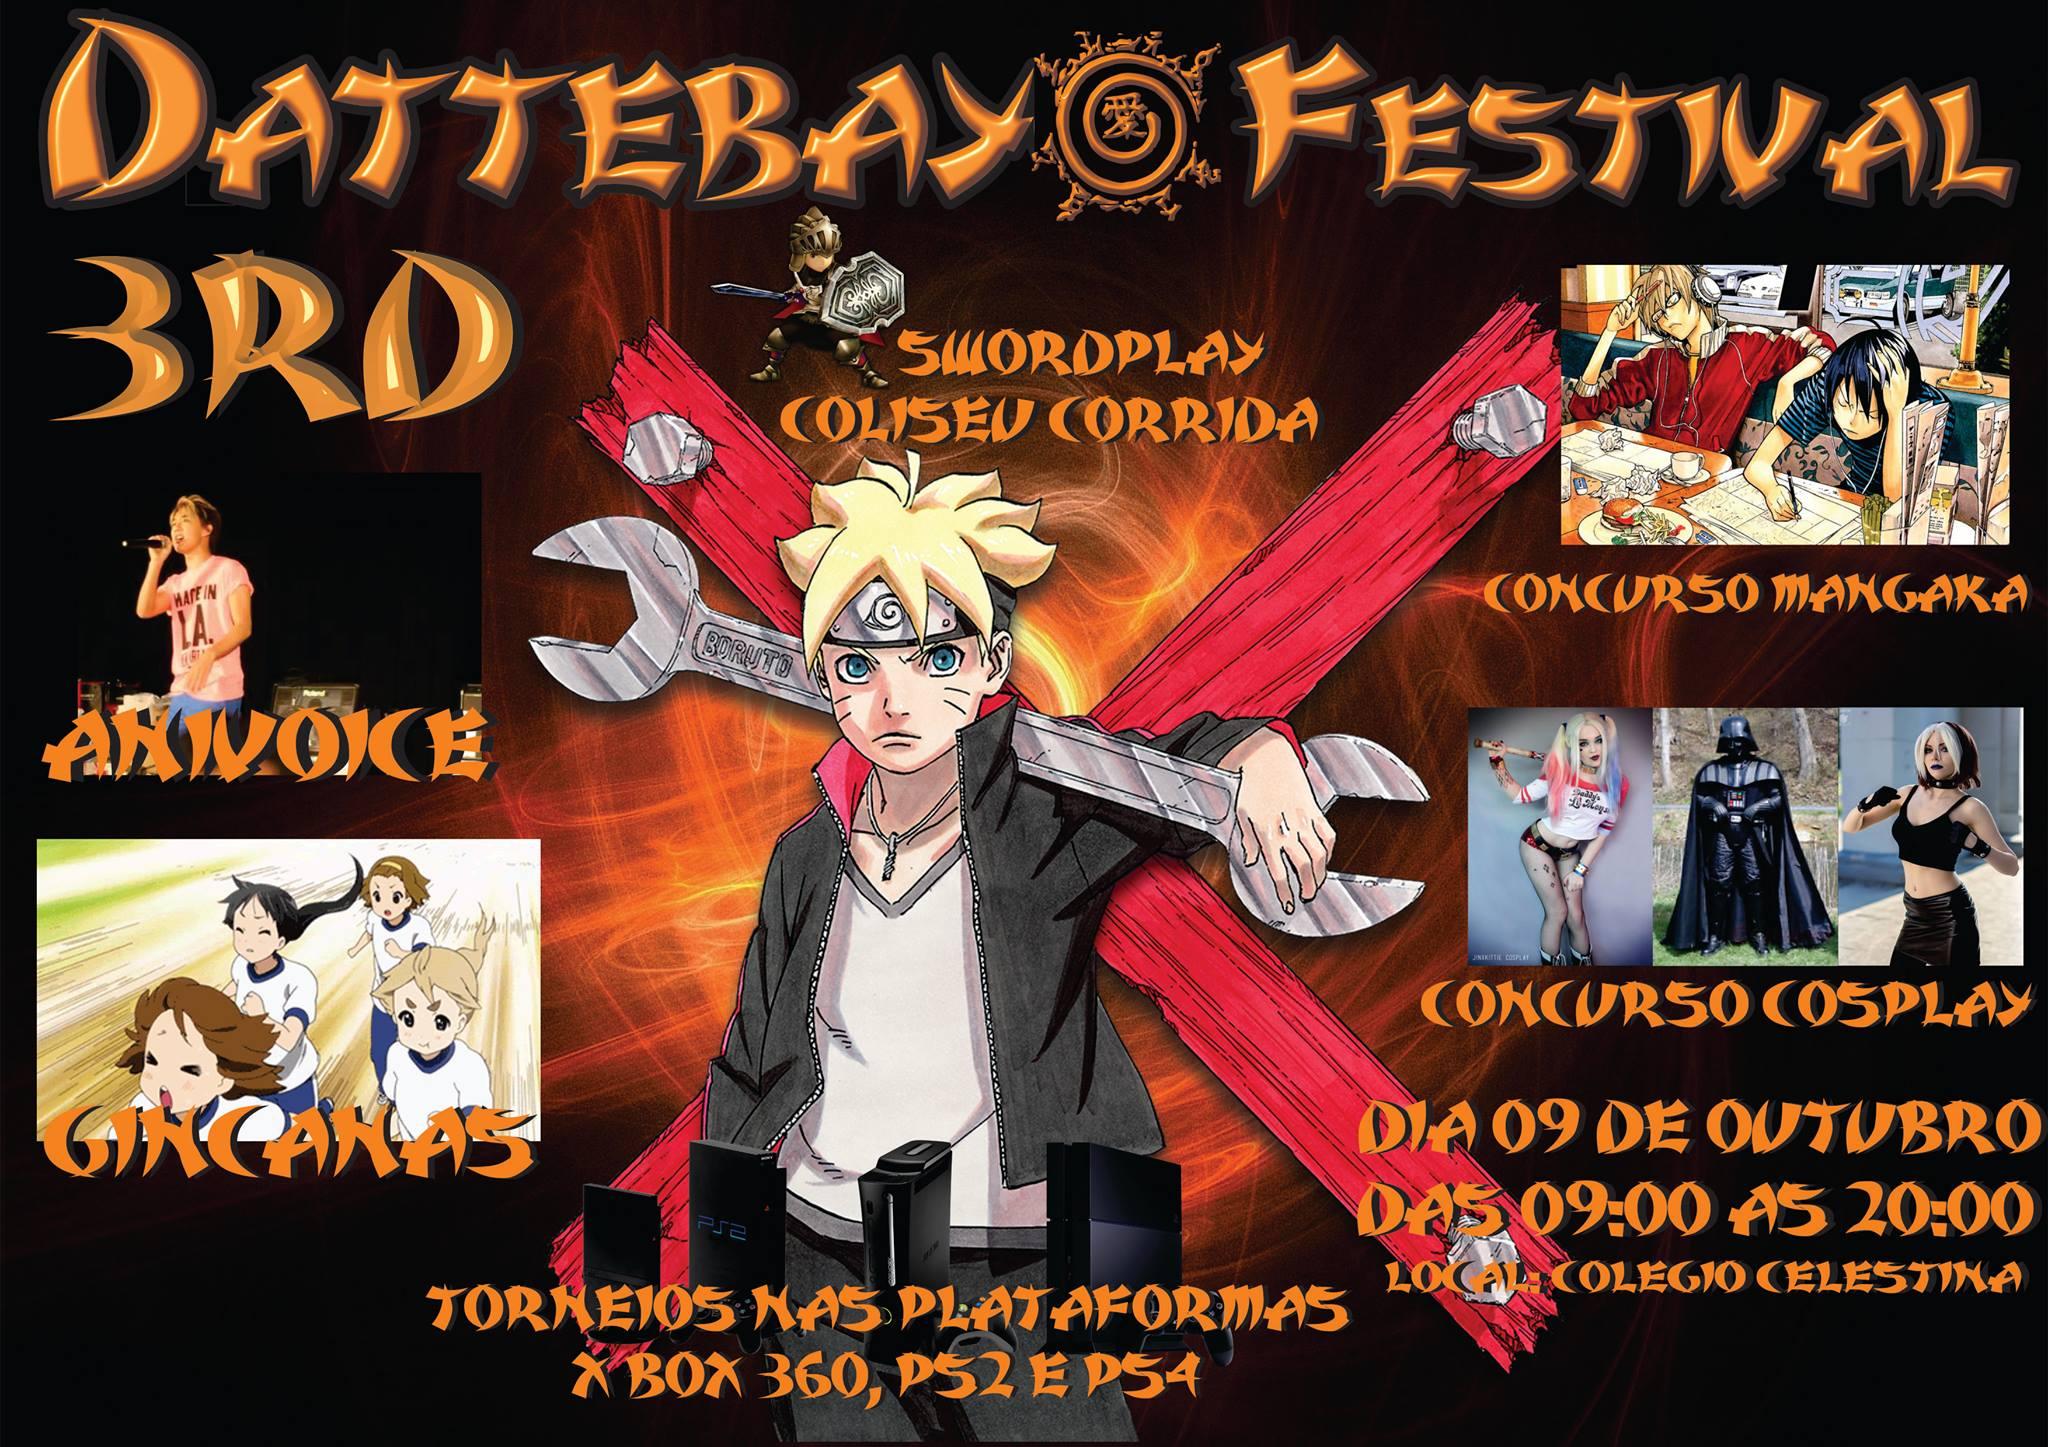 Dattebayo Festival 3rd